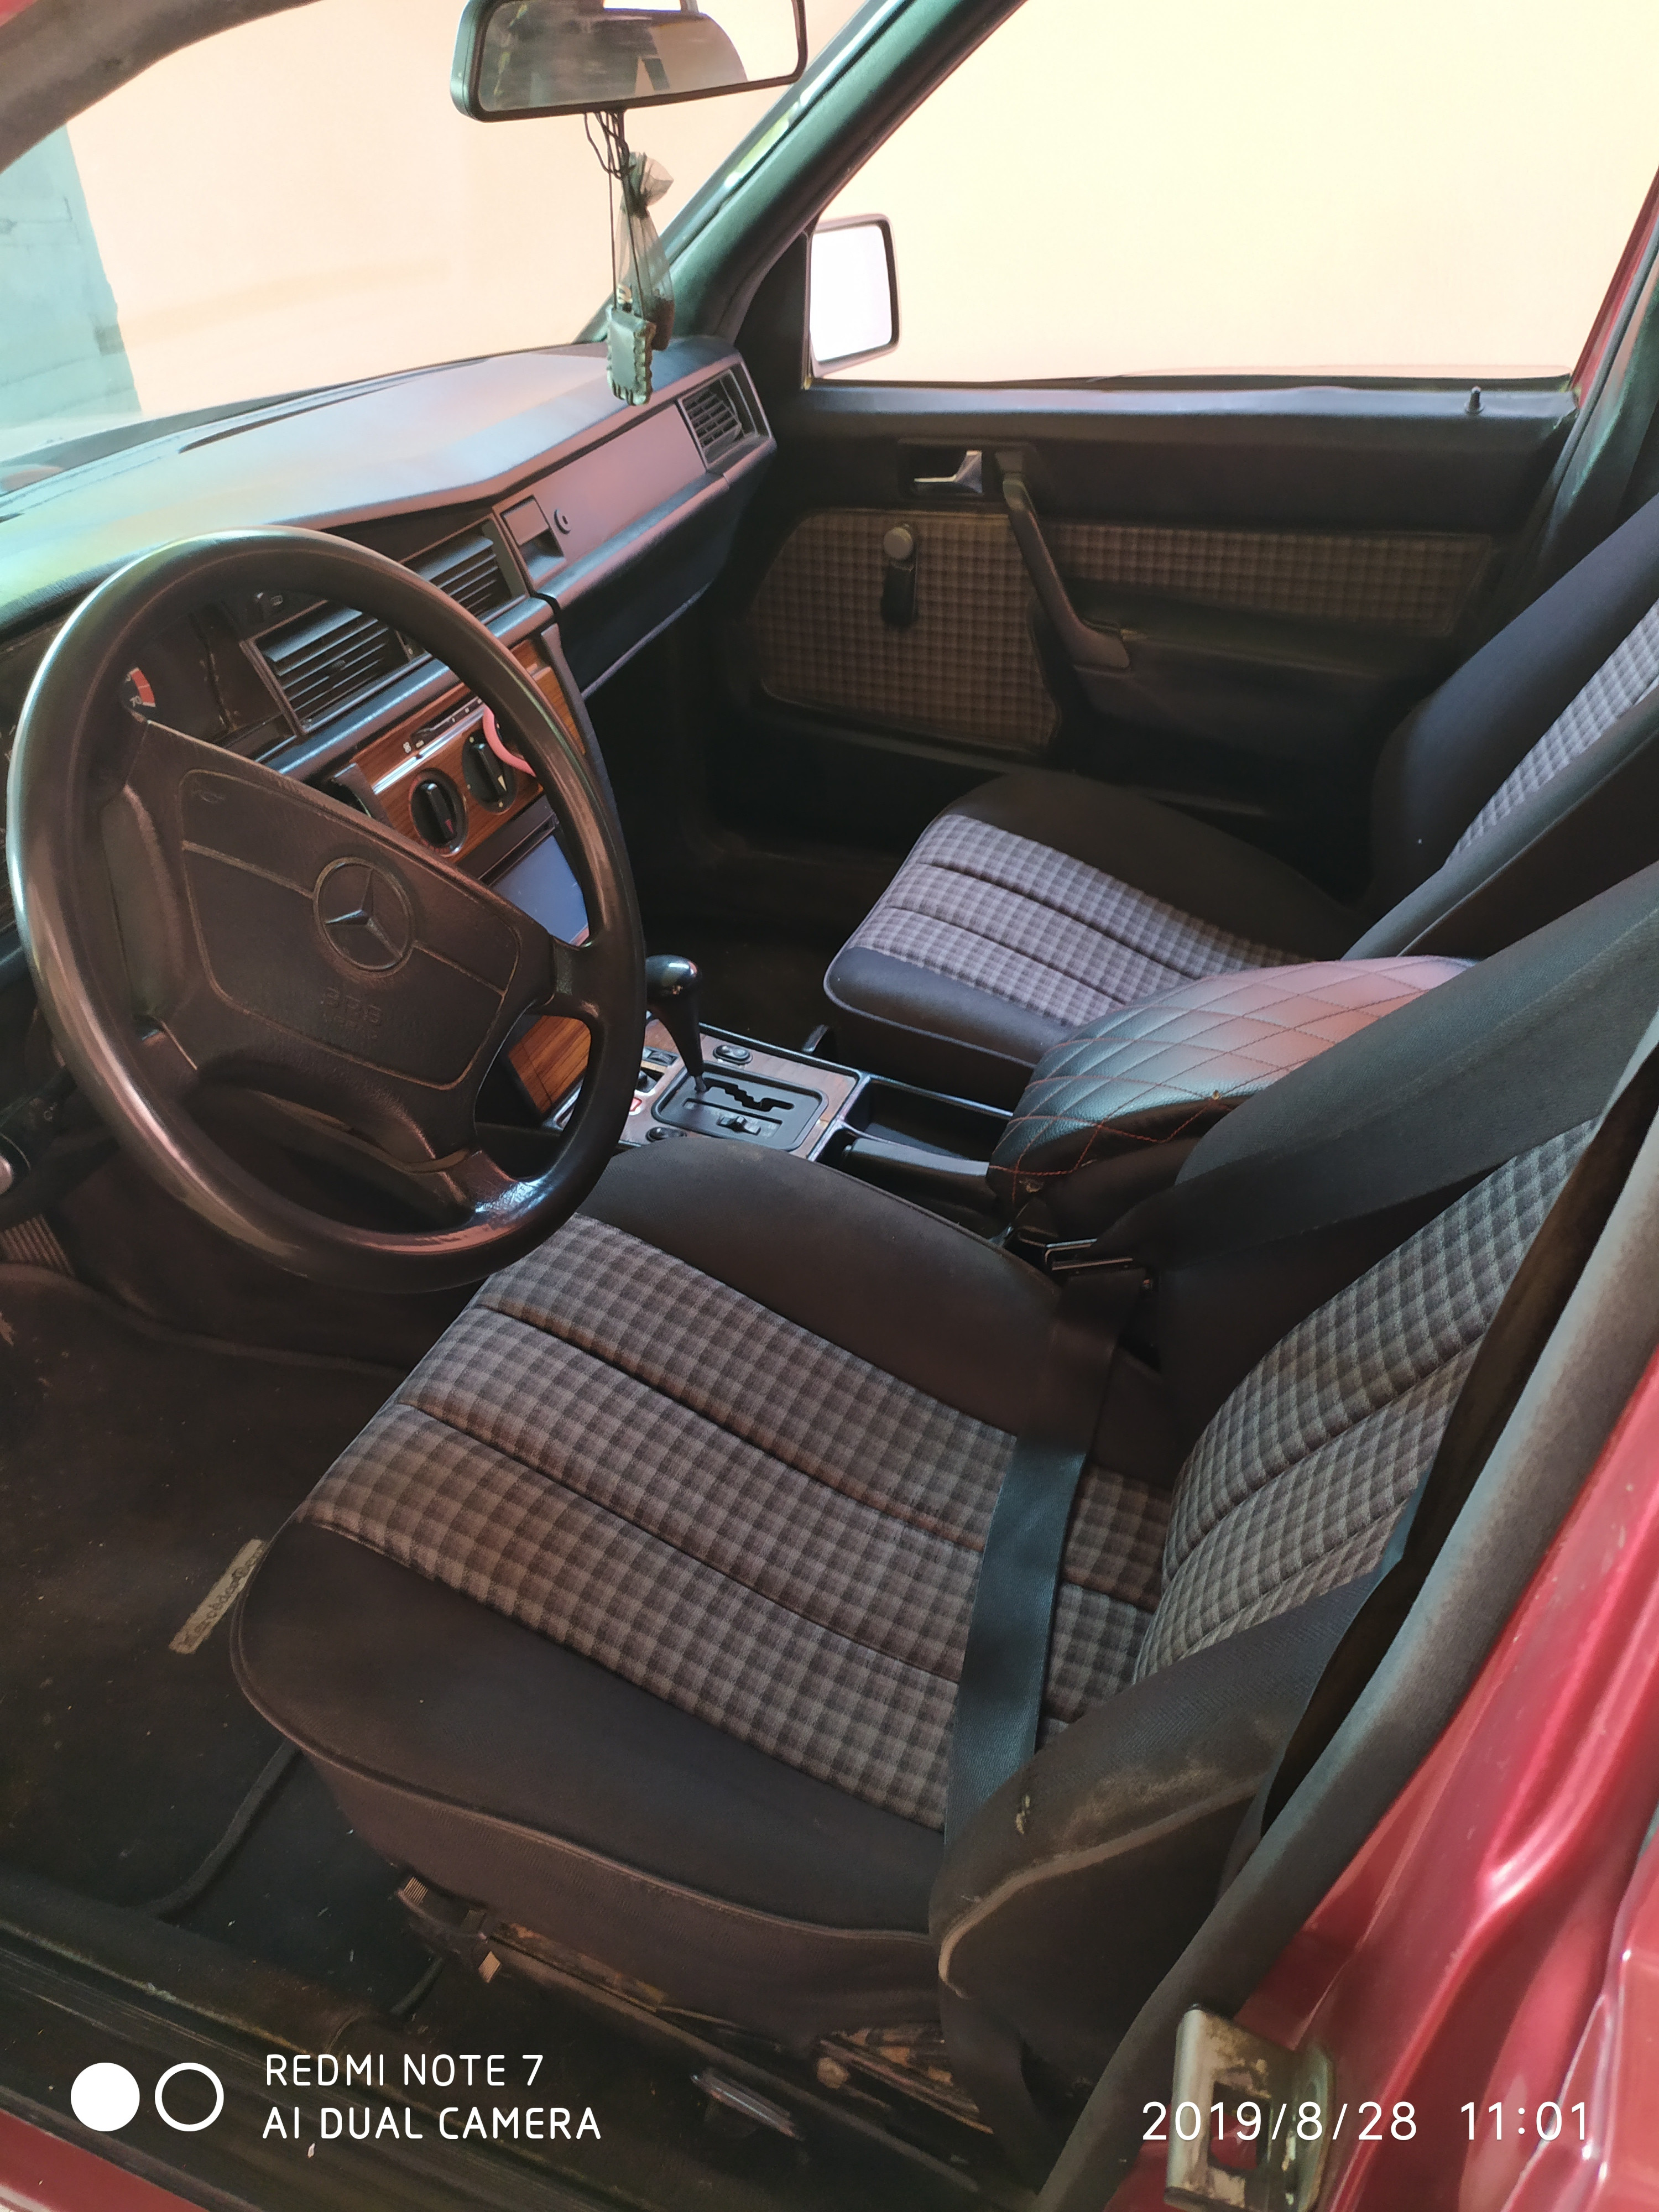 Mercedes-Benz 190 2.0(lt) 1993 İkinci əl  $2700